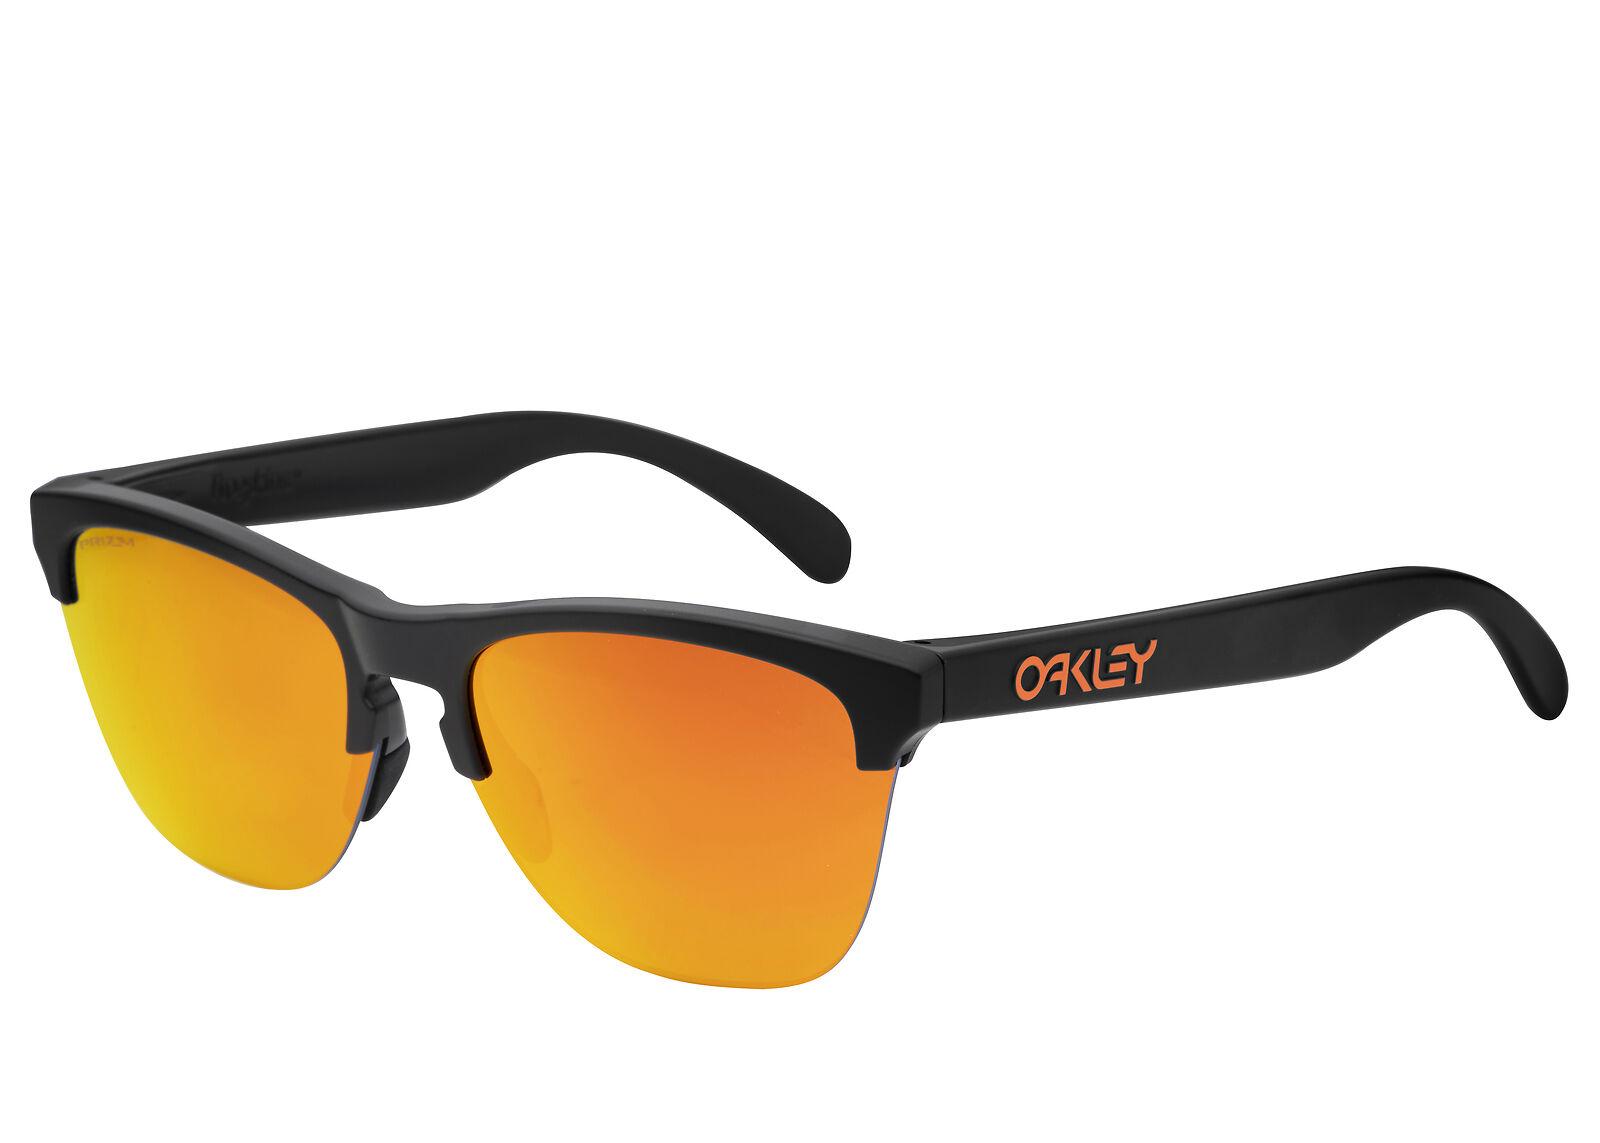 957f439e37e42 Oakley Frogskins Lite sunglasses Black Prizm Ruby OO 9374-05 9374-0563